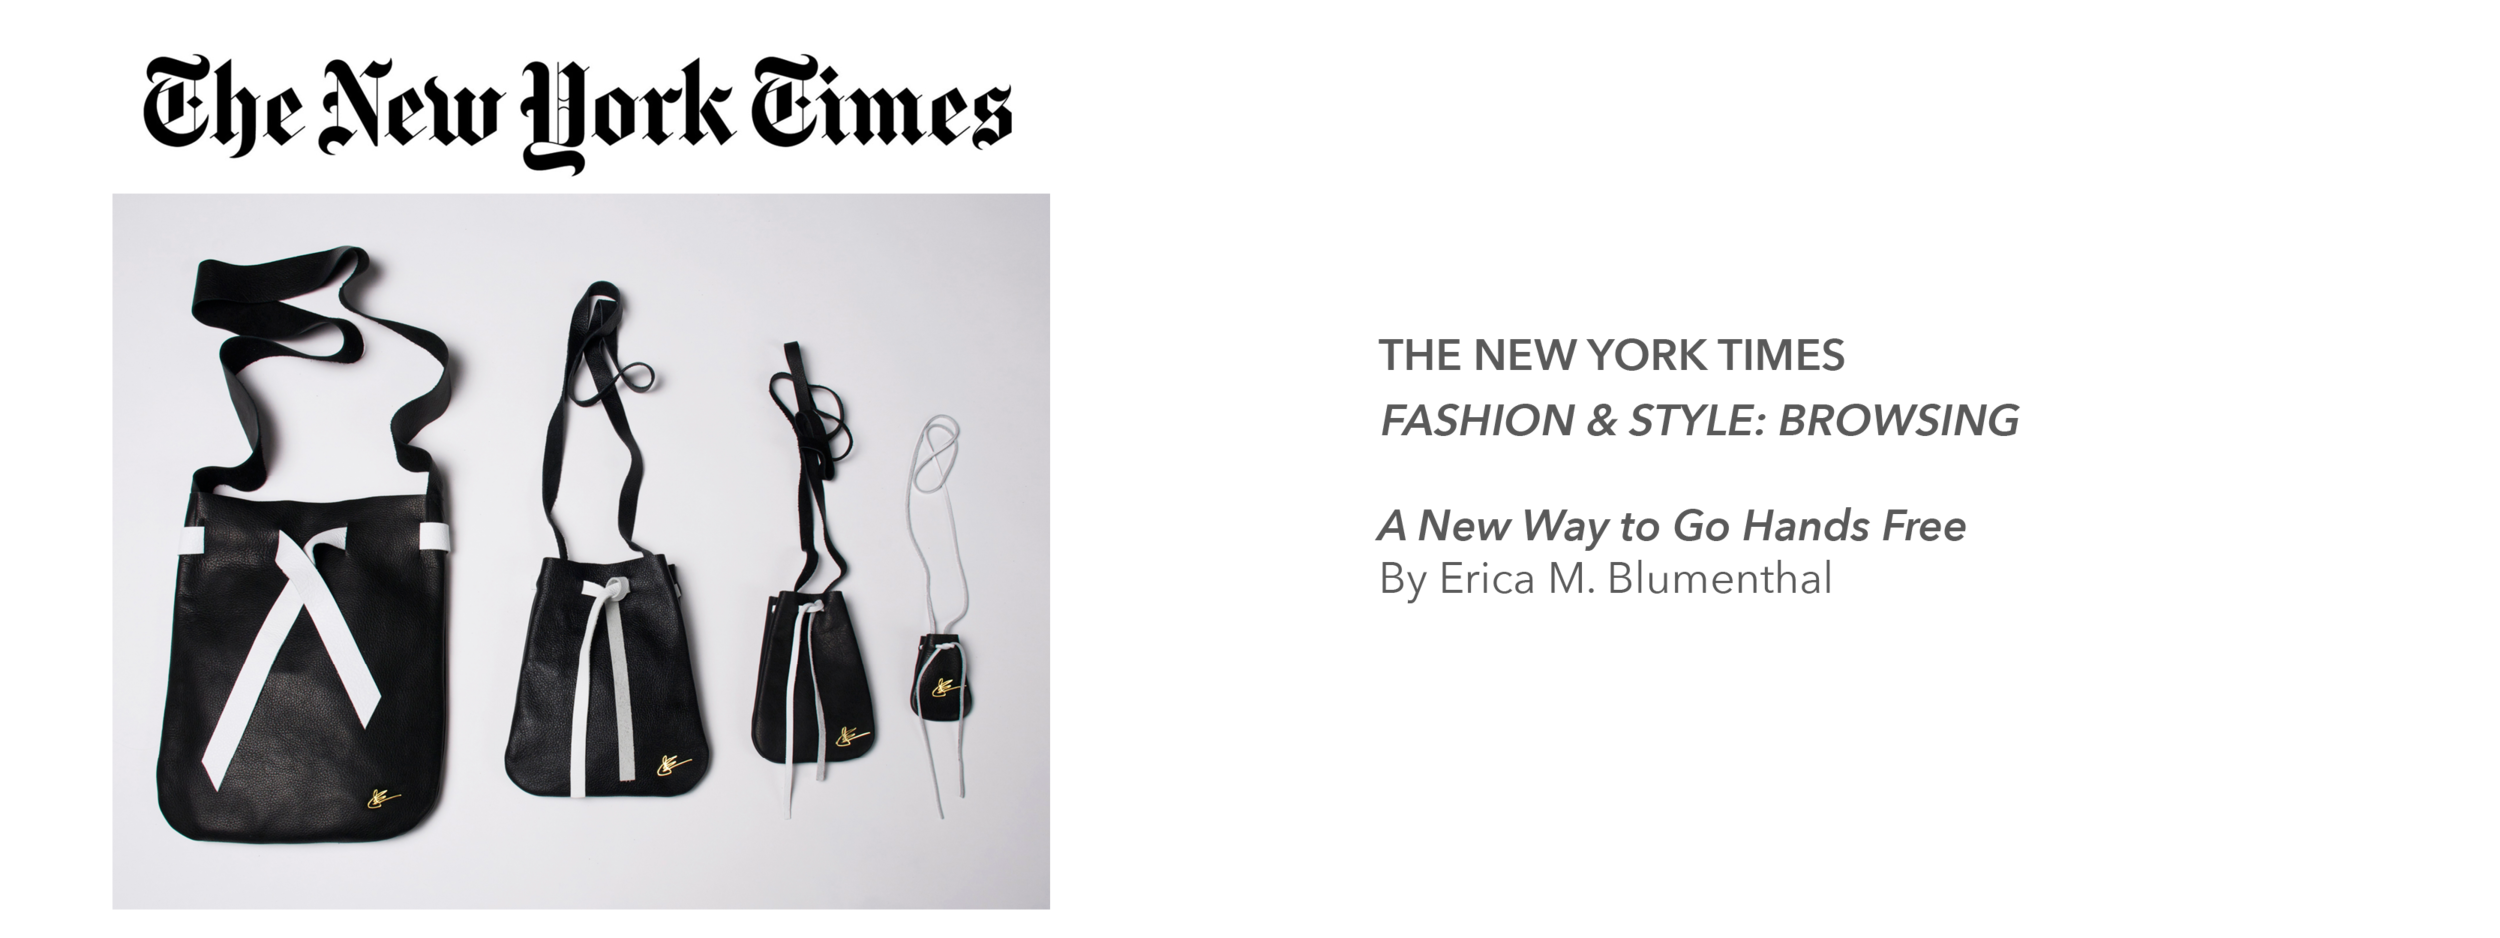 NY-Times-J-ELSTER